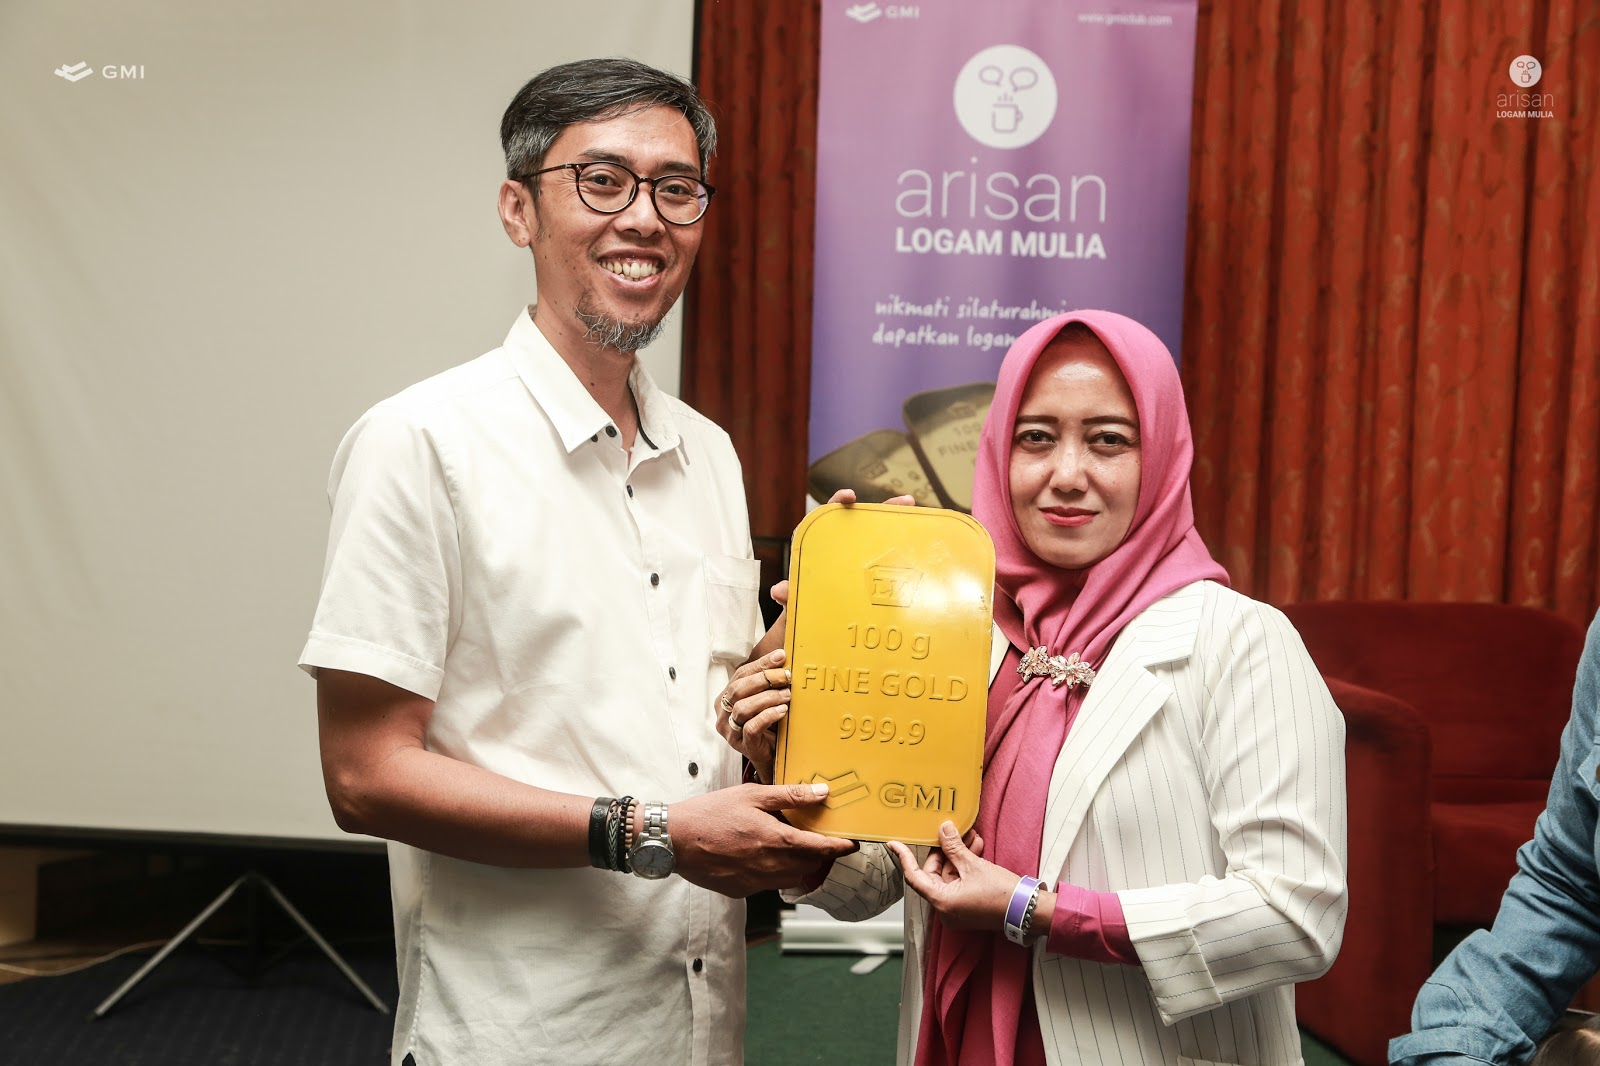 Arisan Logam Mulia GMI Club